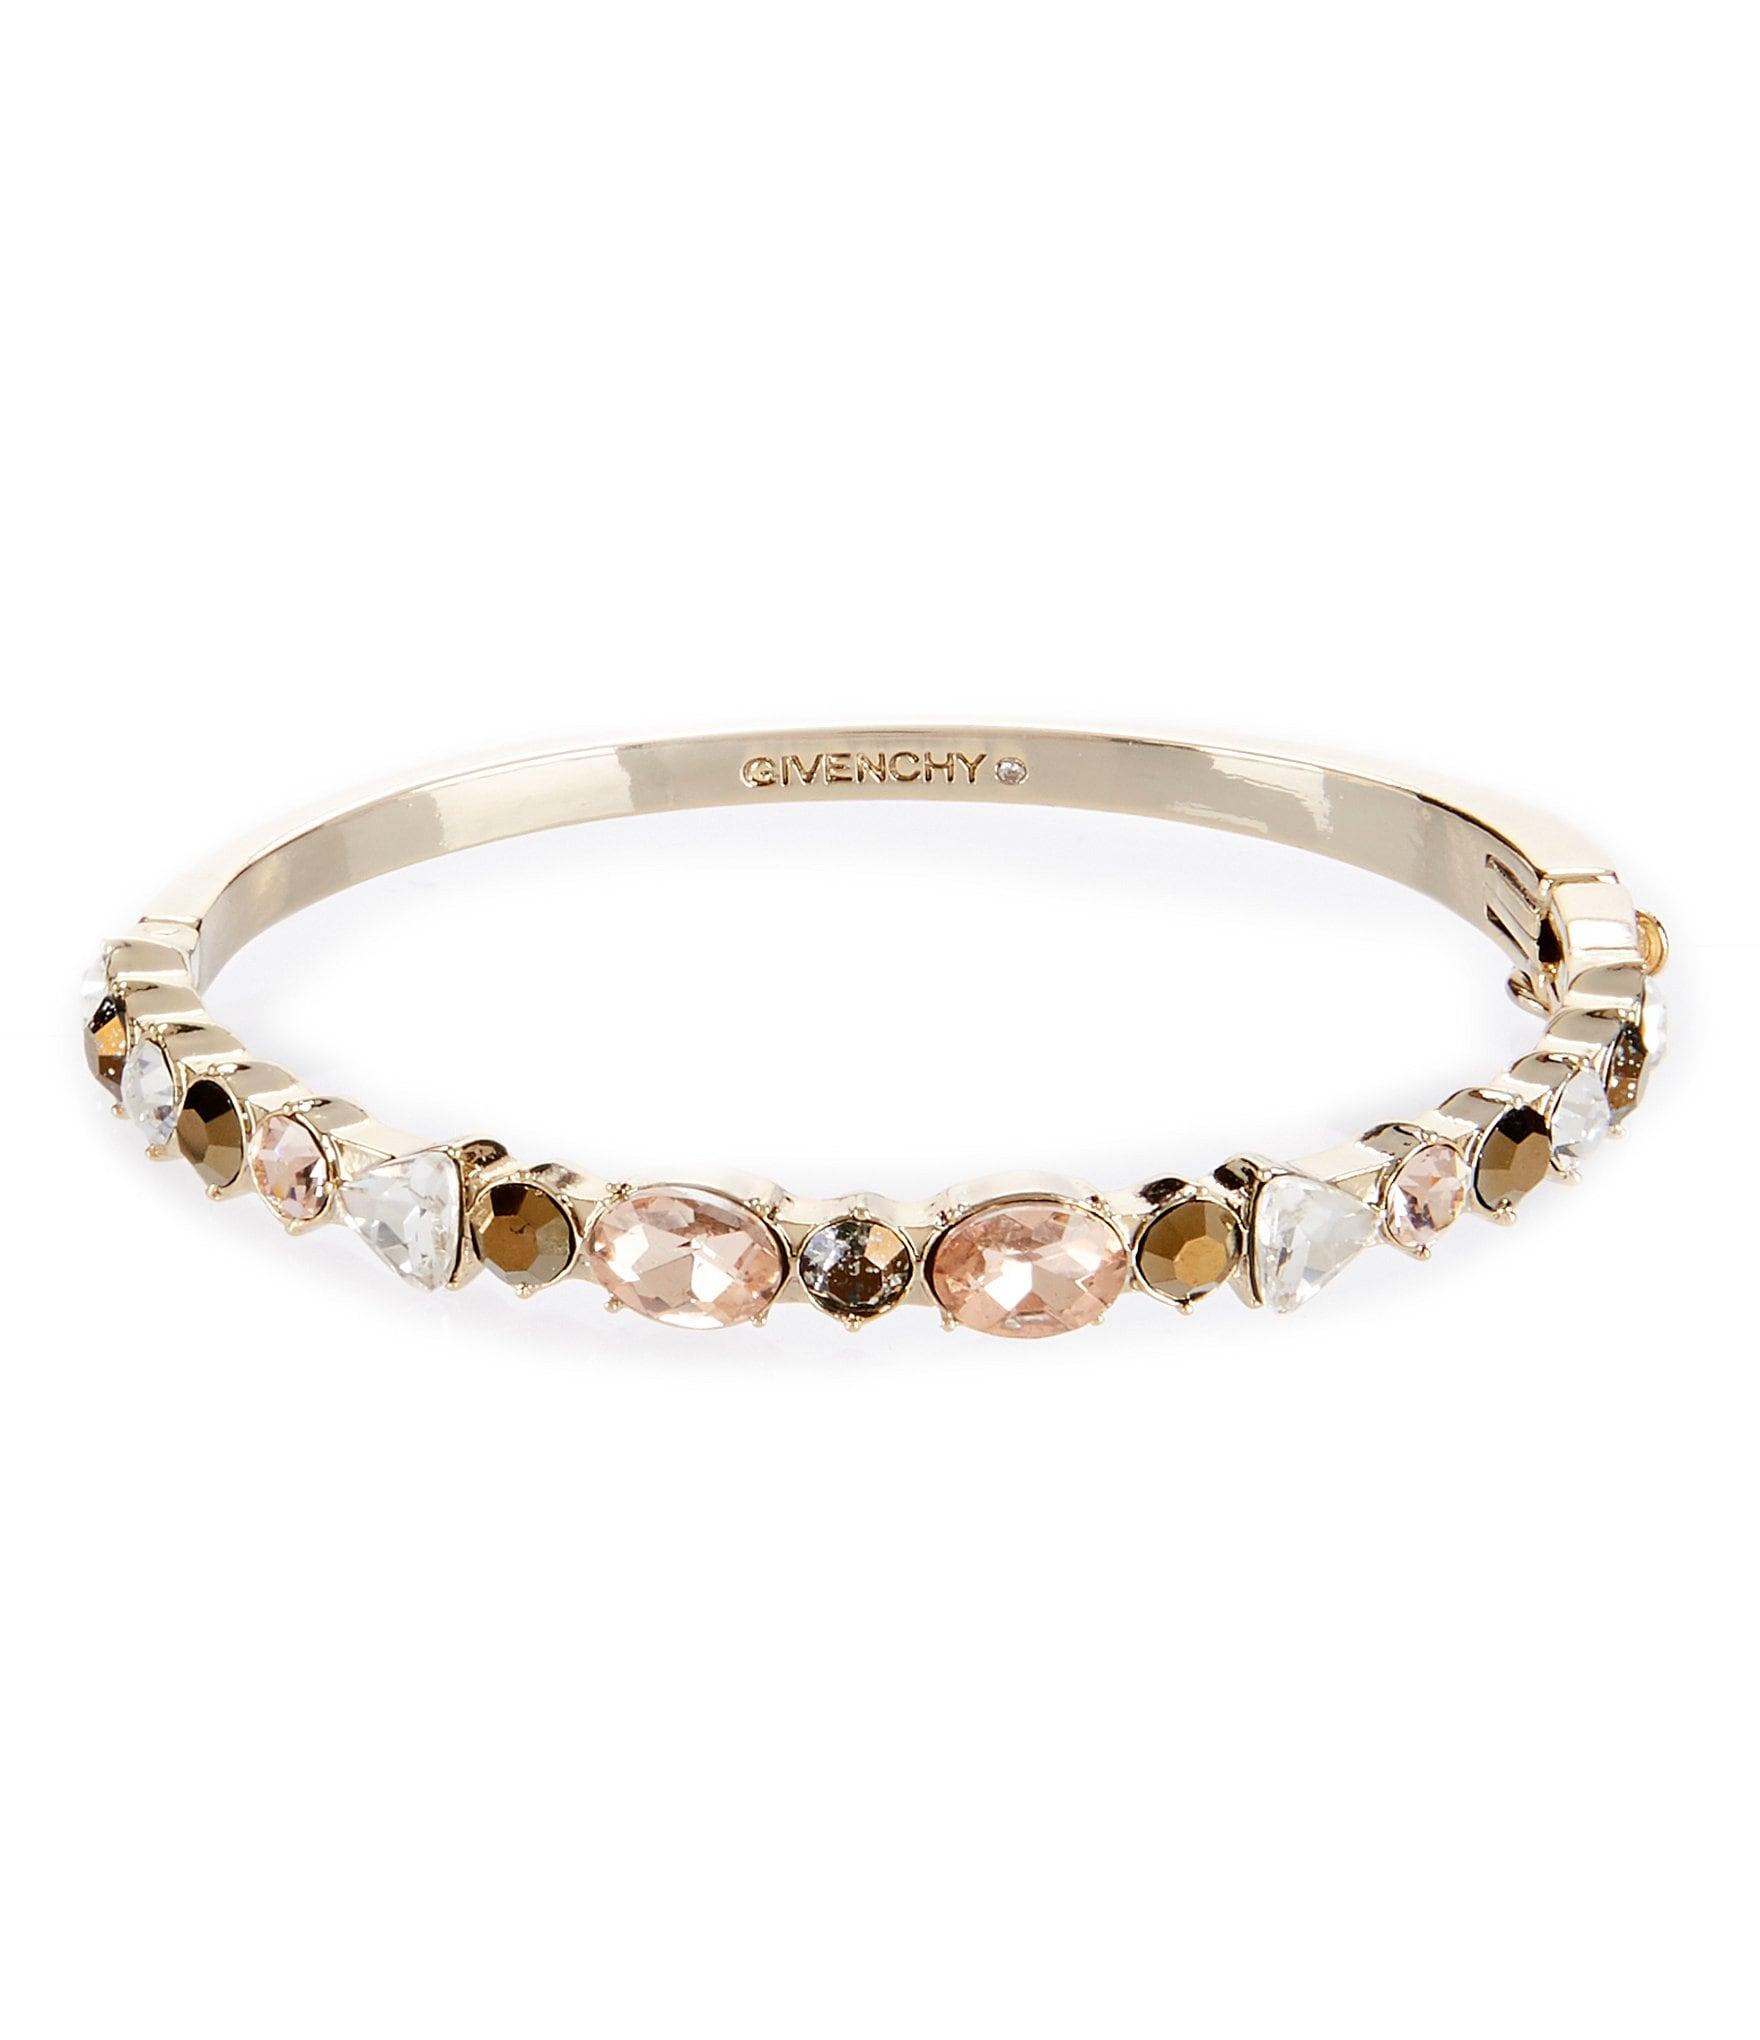 Pandora bracelet dillards - Pandora Bracelet Dillards 5